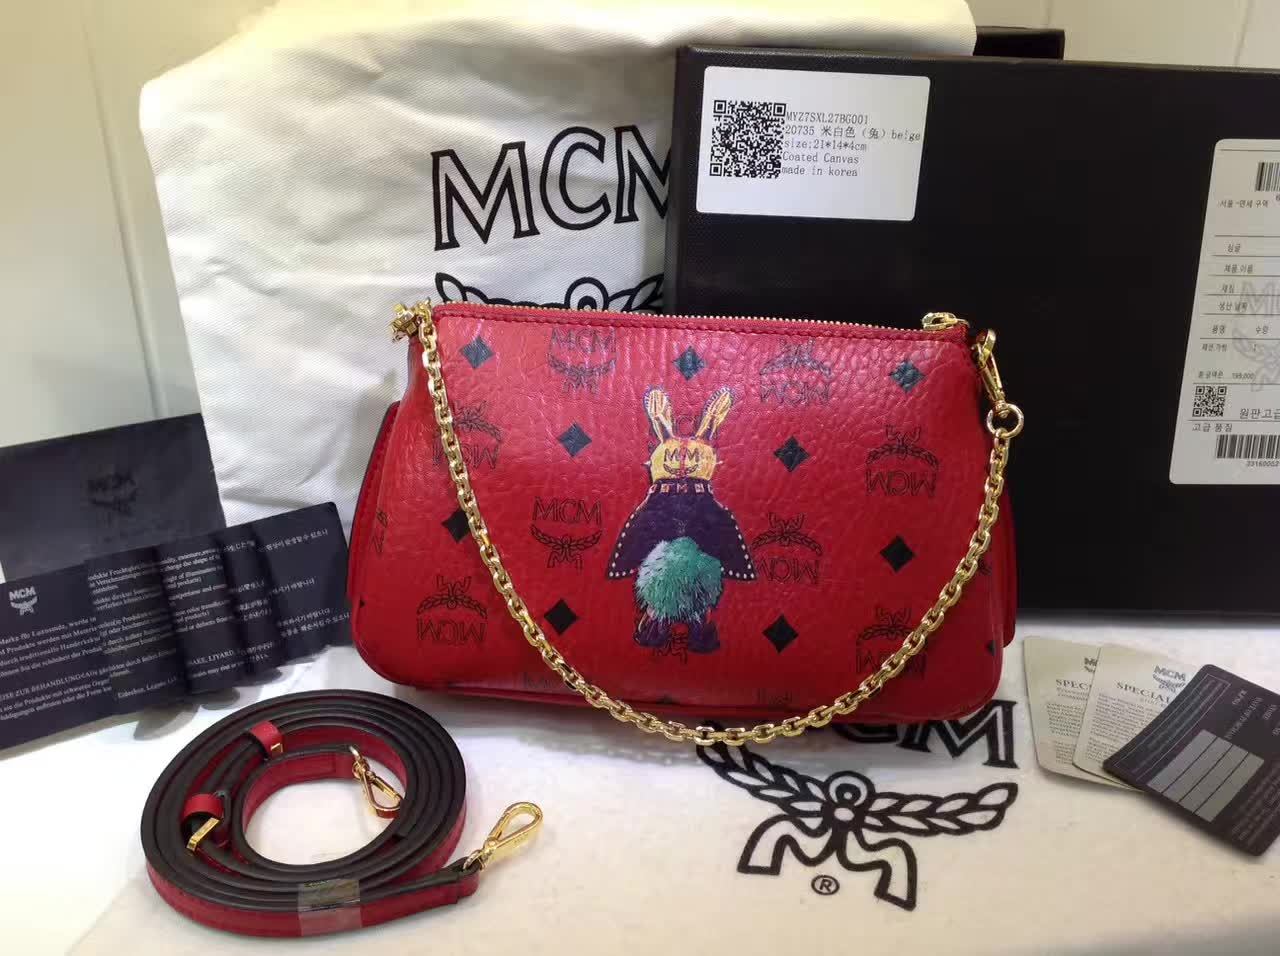 MCM专柜新款 链条斜挎两用包 新纹路PVC配高品质牛皮 绒布内里 大红